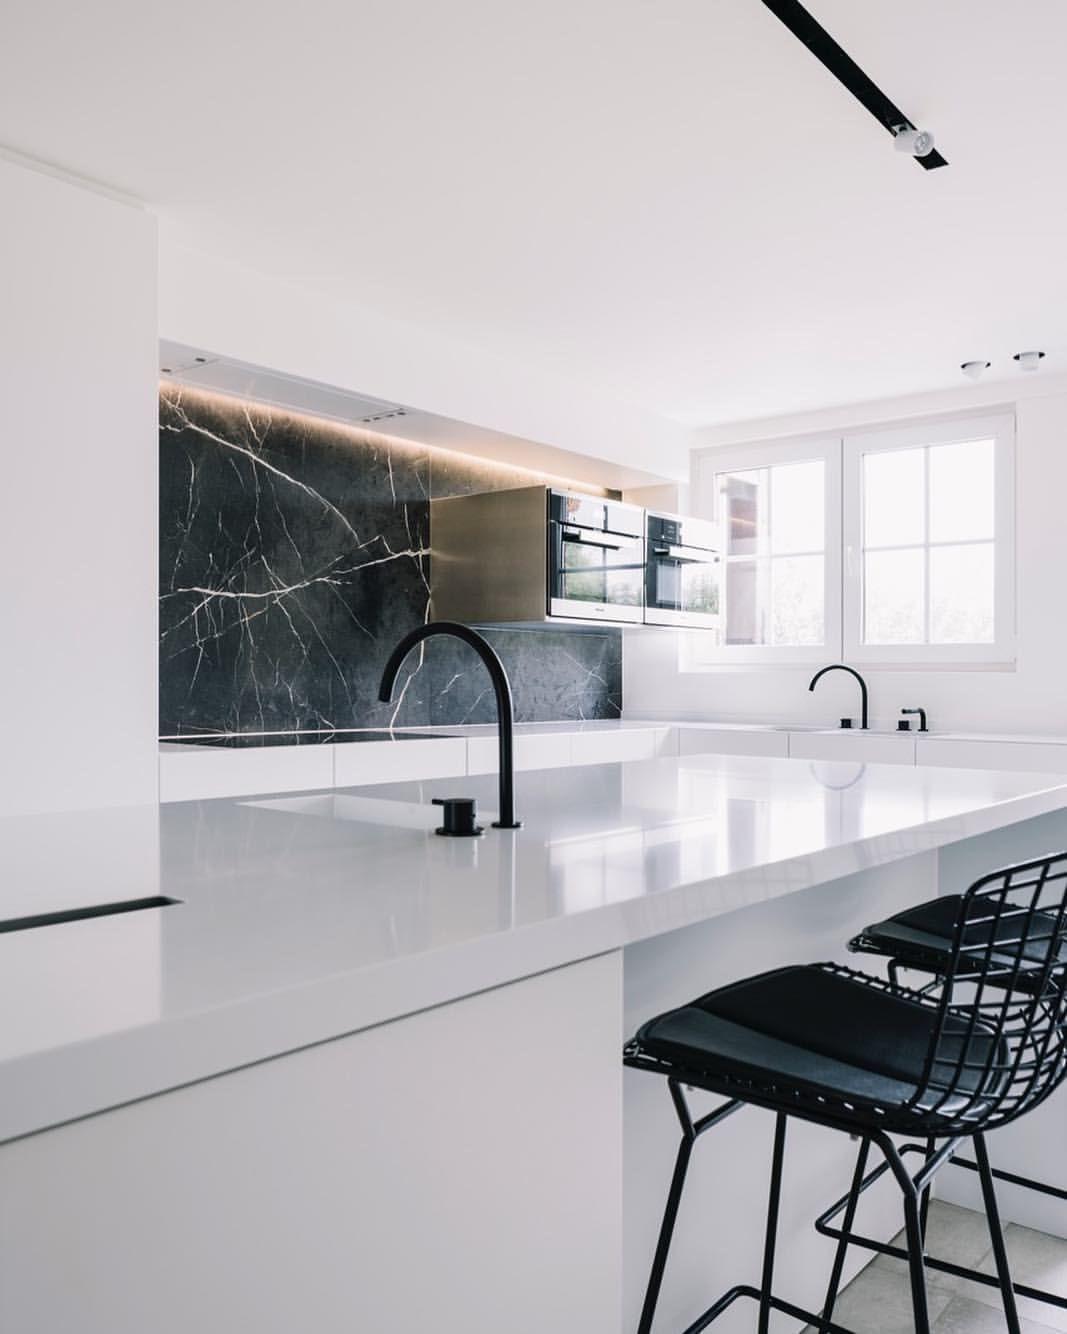 Home-office-innenarchitektur inspiration int arch pieter schoolaert på instagram ucproject hwkalken